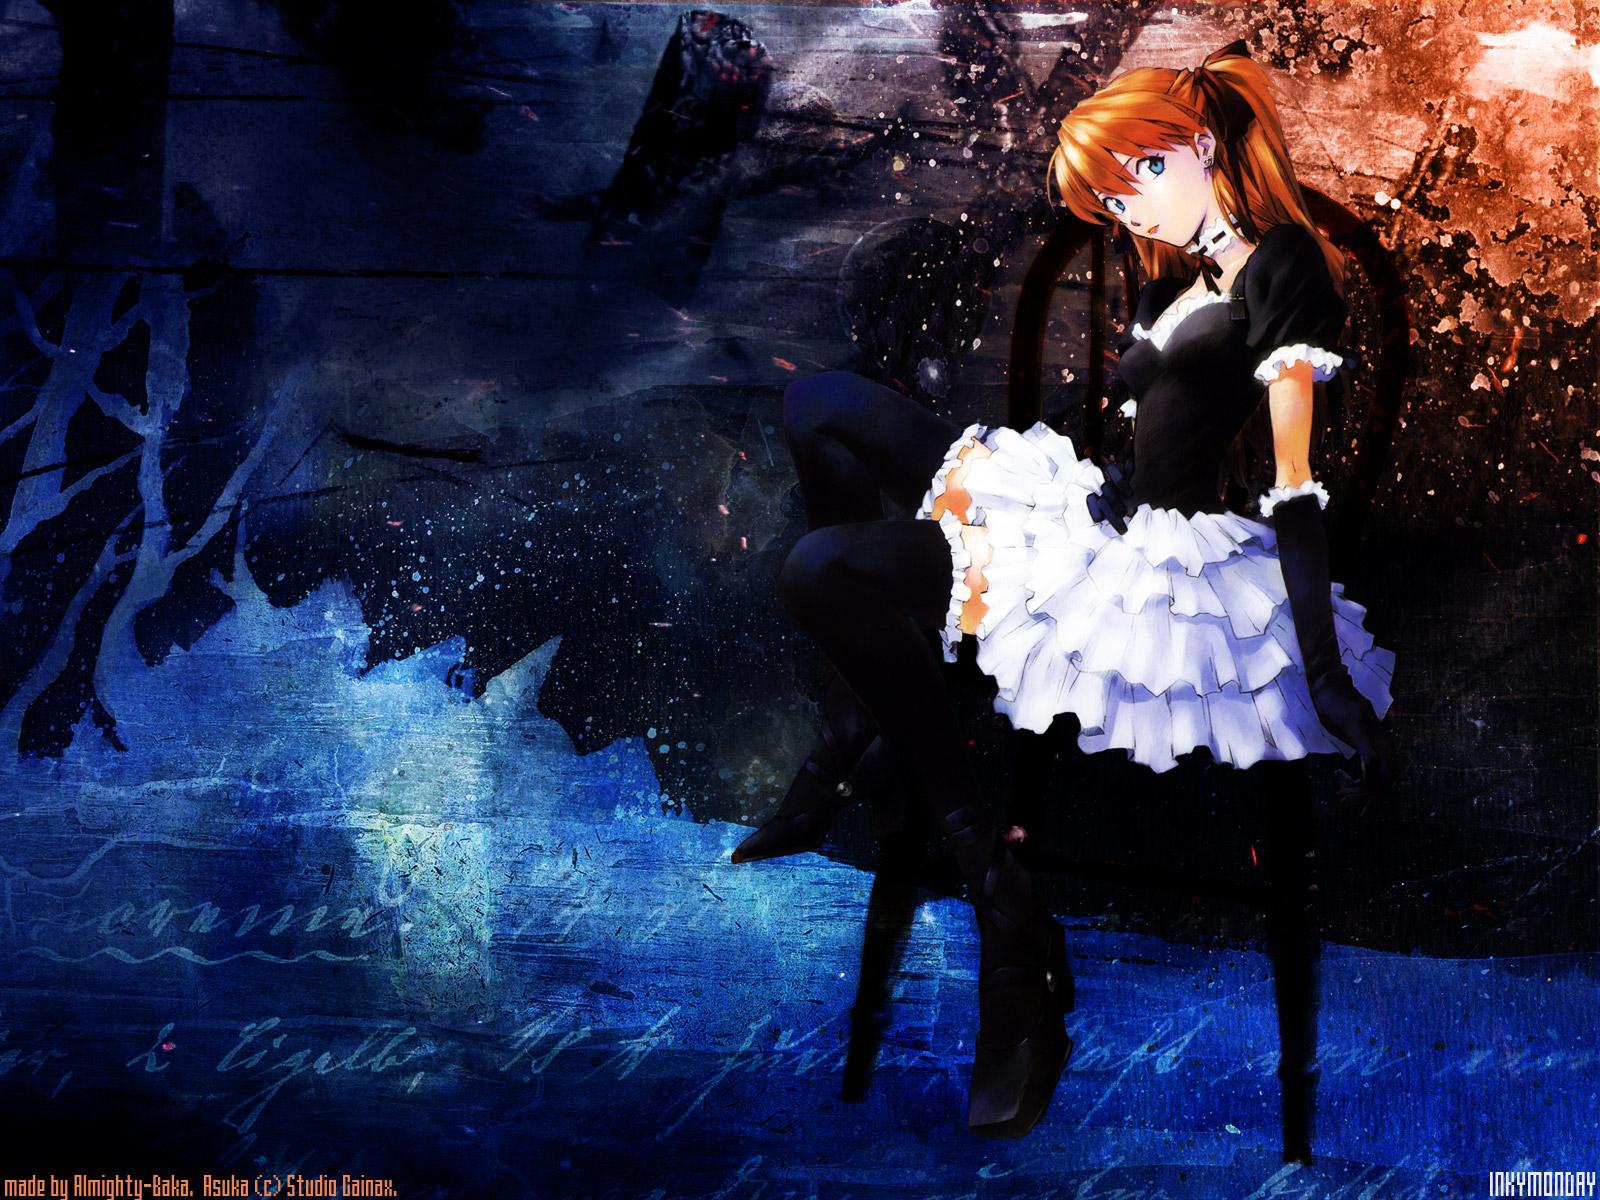 http://4.bp.blogspot.com/_NLRAZCDECLA/Sp8lfqB4oHI/AAAAAAAABzU/THJEFRD6QPw/s1600/anime_gotico_wallpapers_fondos_imagenes_0010.jpg